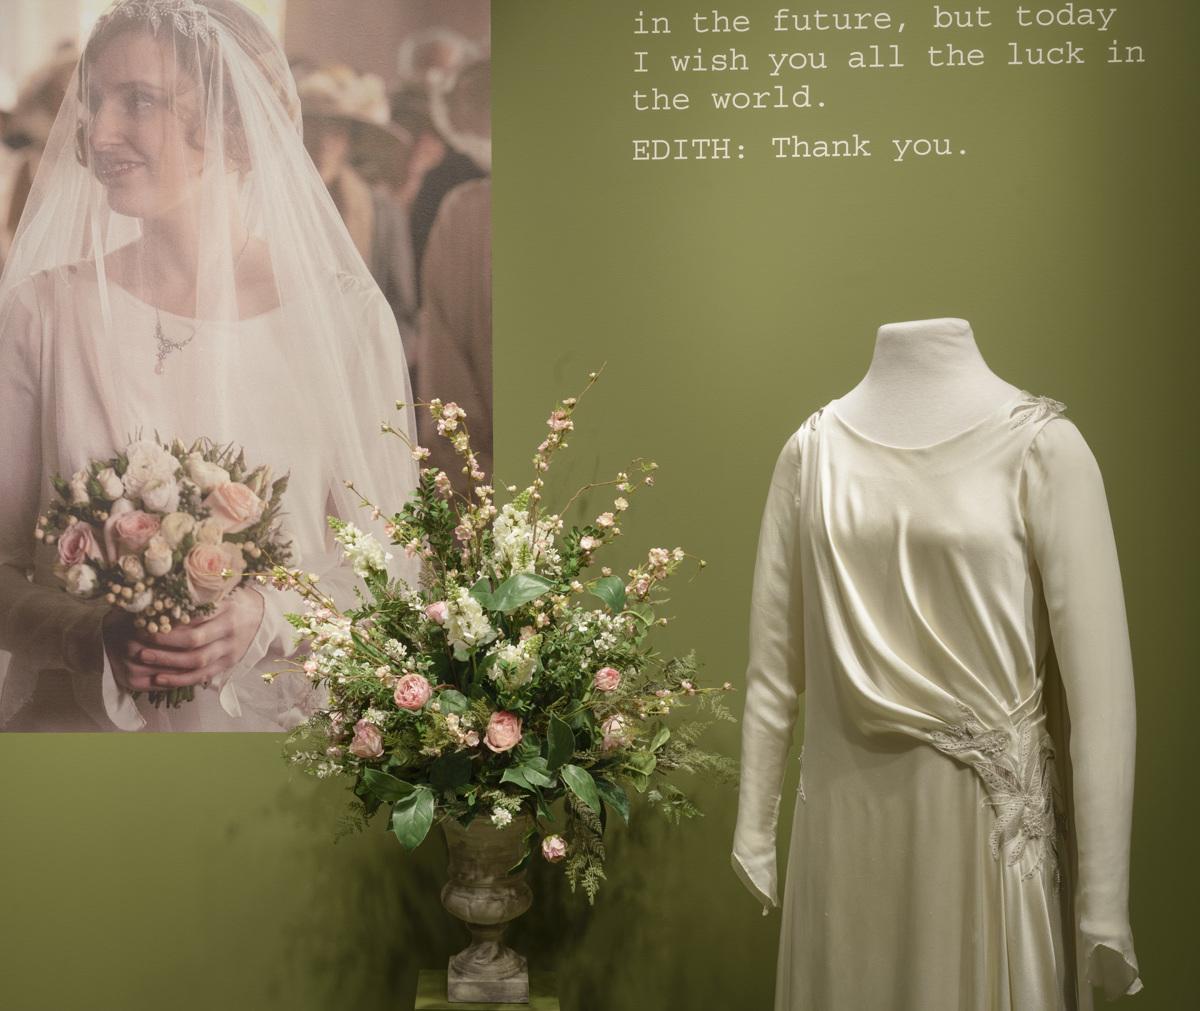 Lady Edith's wedding dress